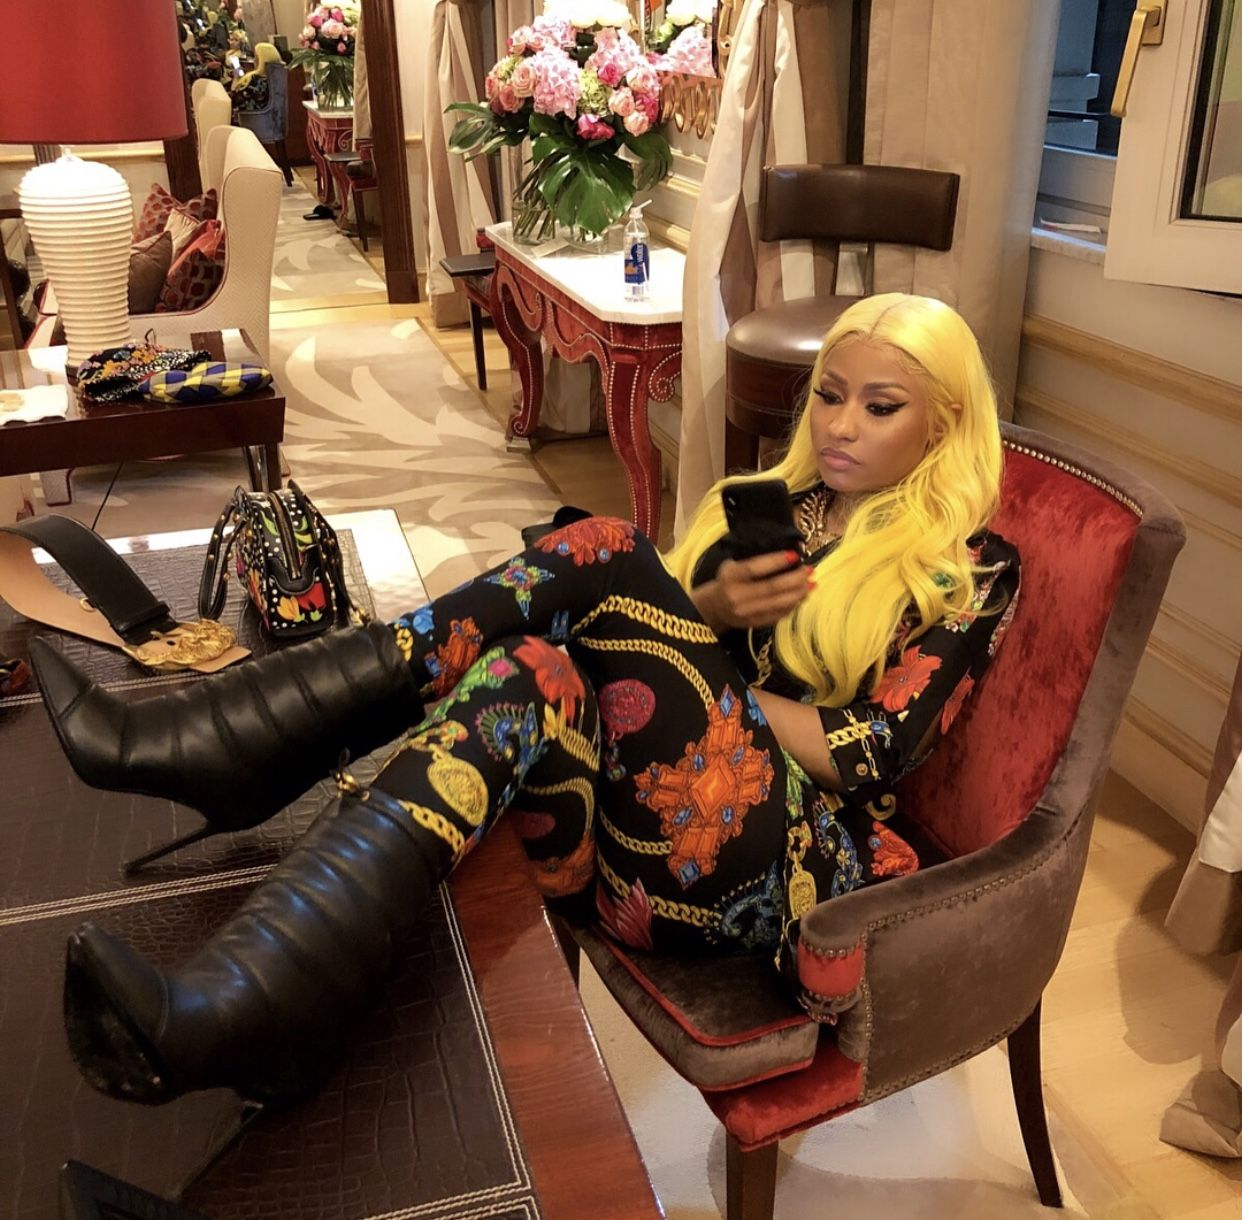 Pin by Lil Baddie Ltd. on onika Nicki Minaj, Fashion